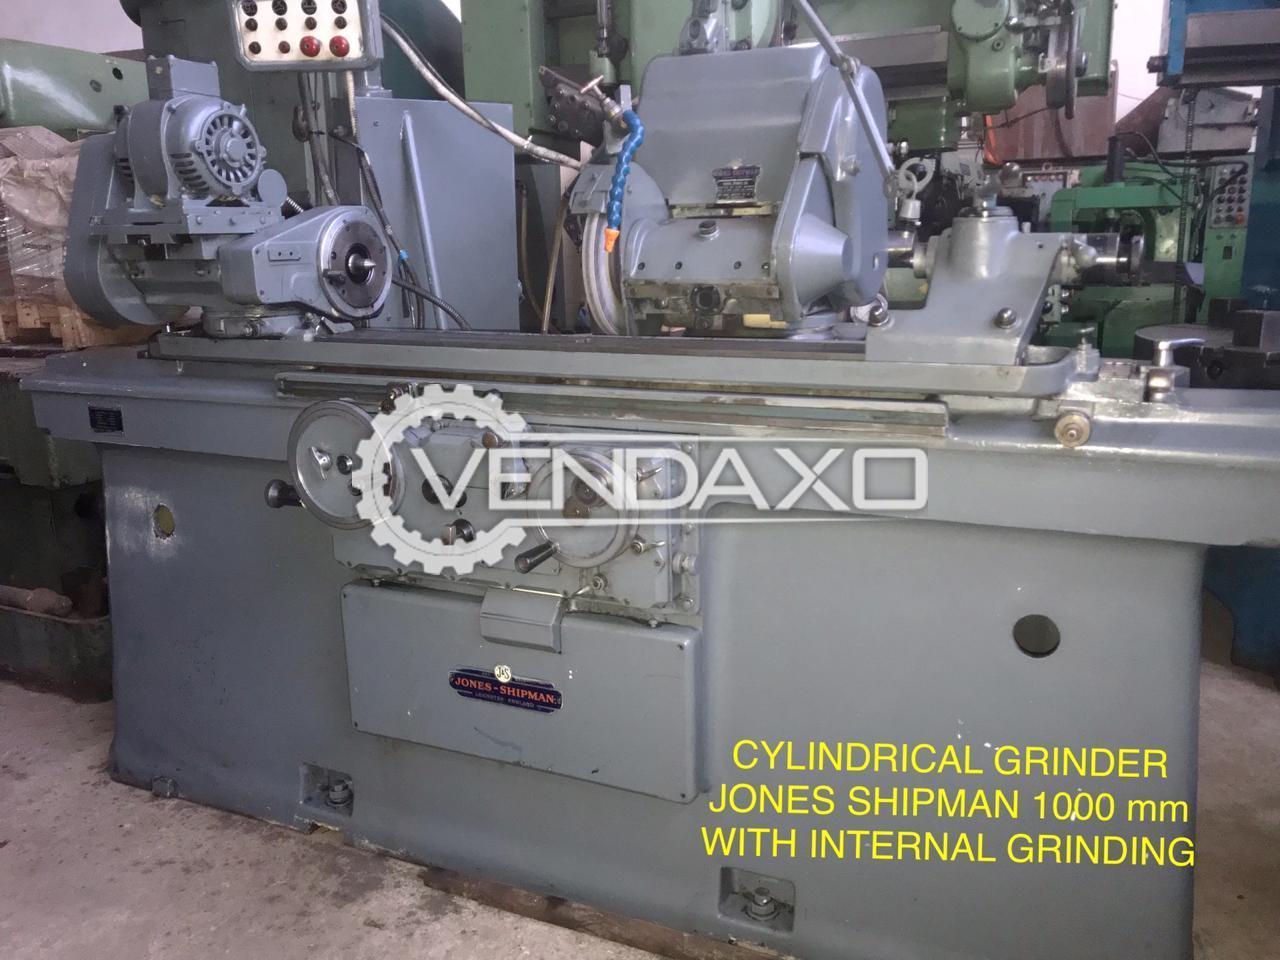 Jones & Shipman Cylindrical Grinder Machine - 1000 mm